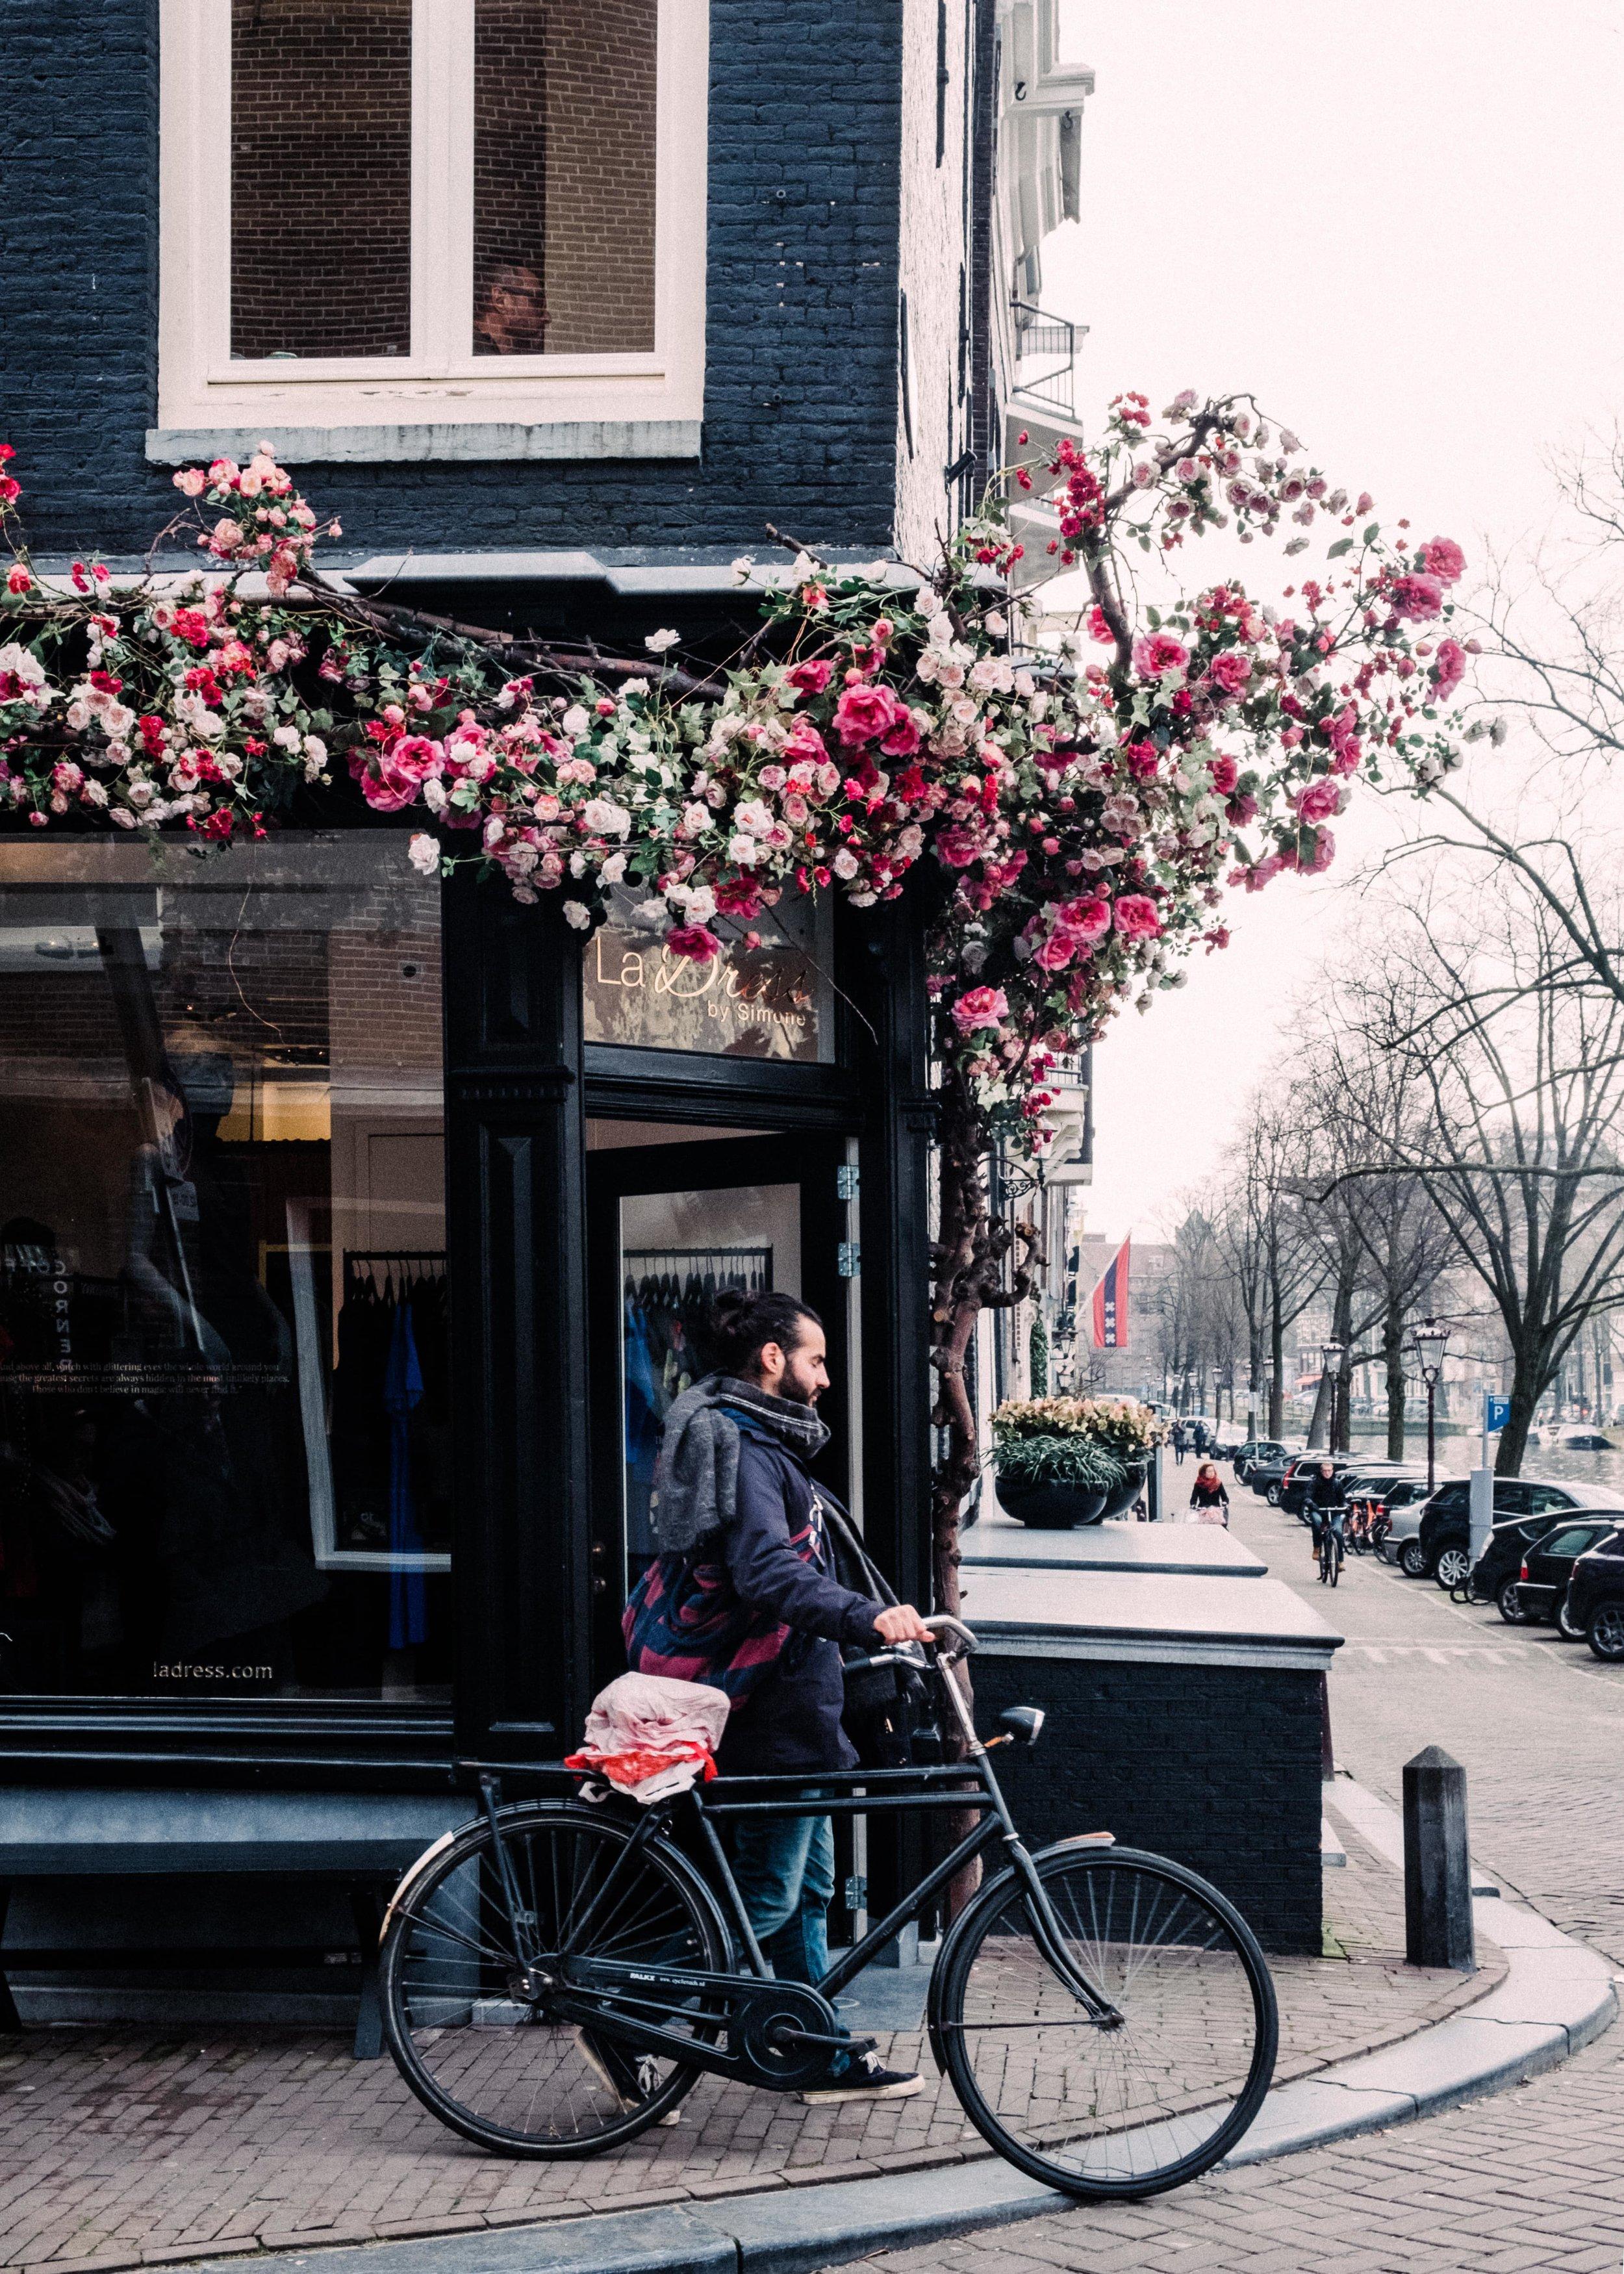 Amsterdam_JuliaMattis_Photo02-min.jpg